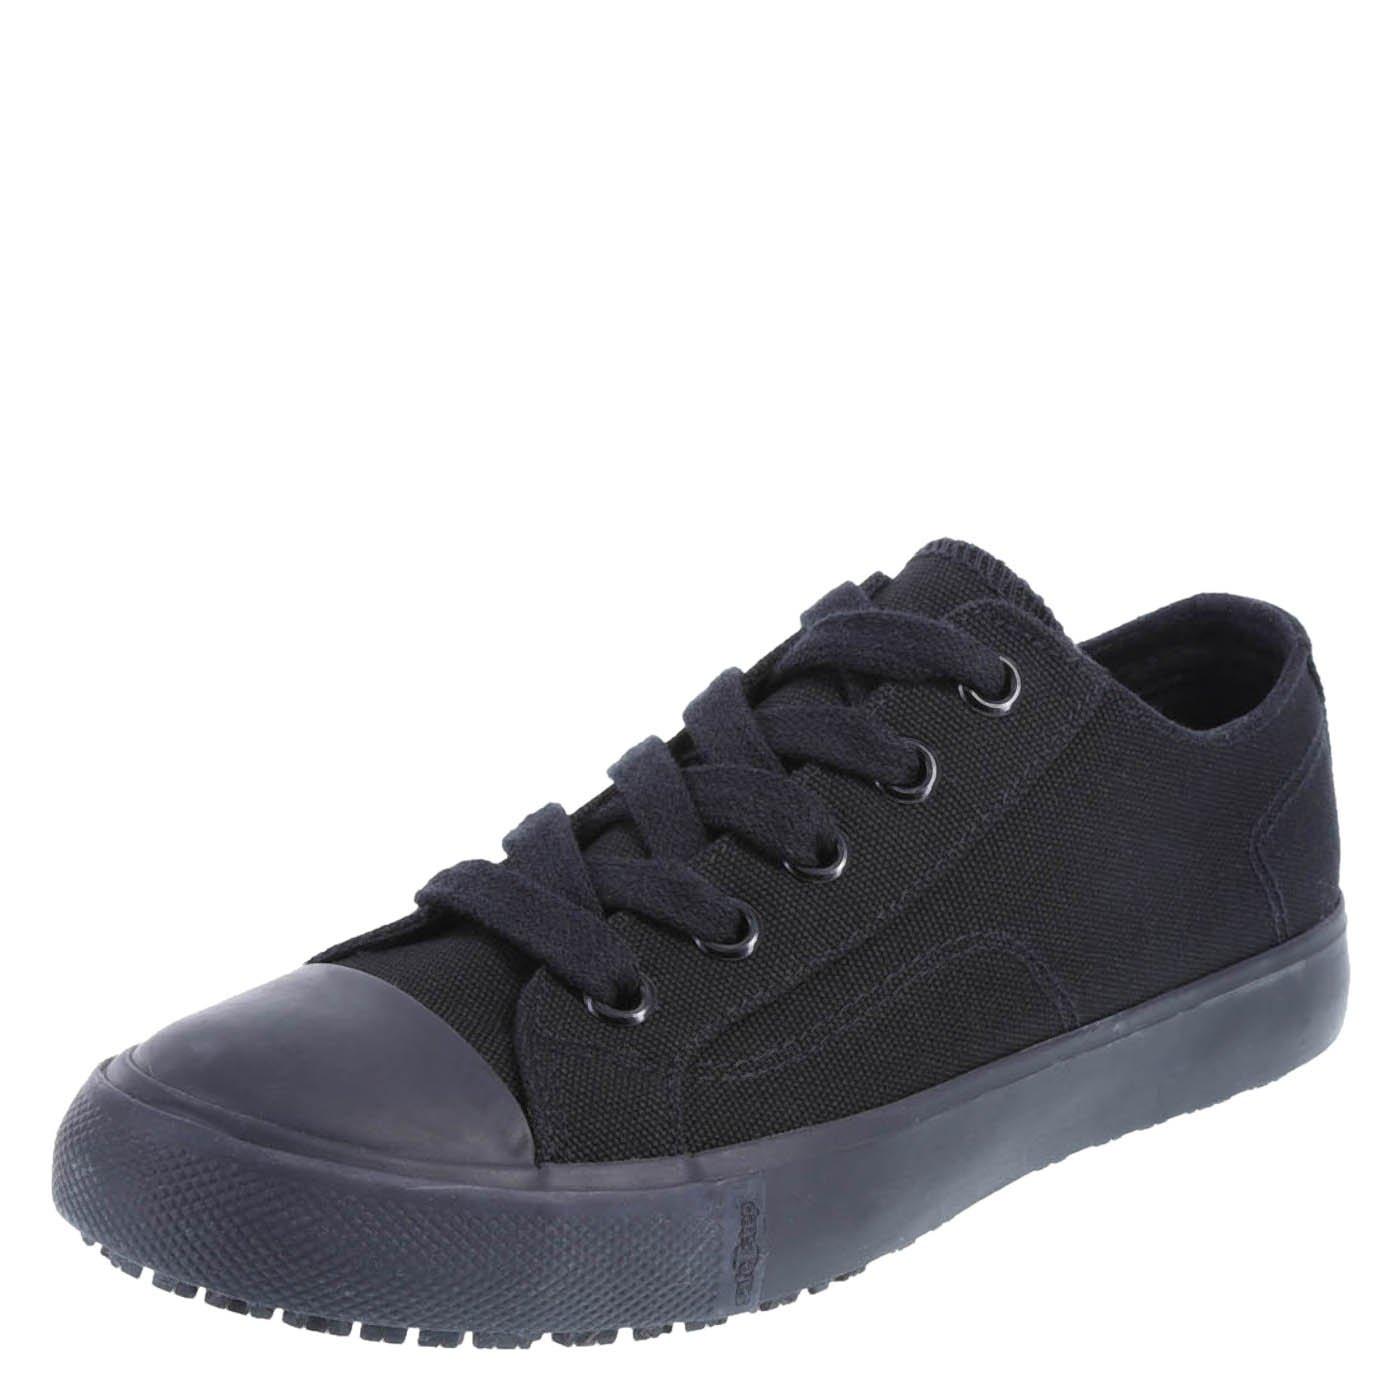 safeTstep Slip Resistant Women's Black Canvas Women's Kick Canvas Oxford 5 Regular